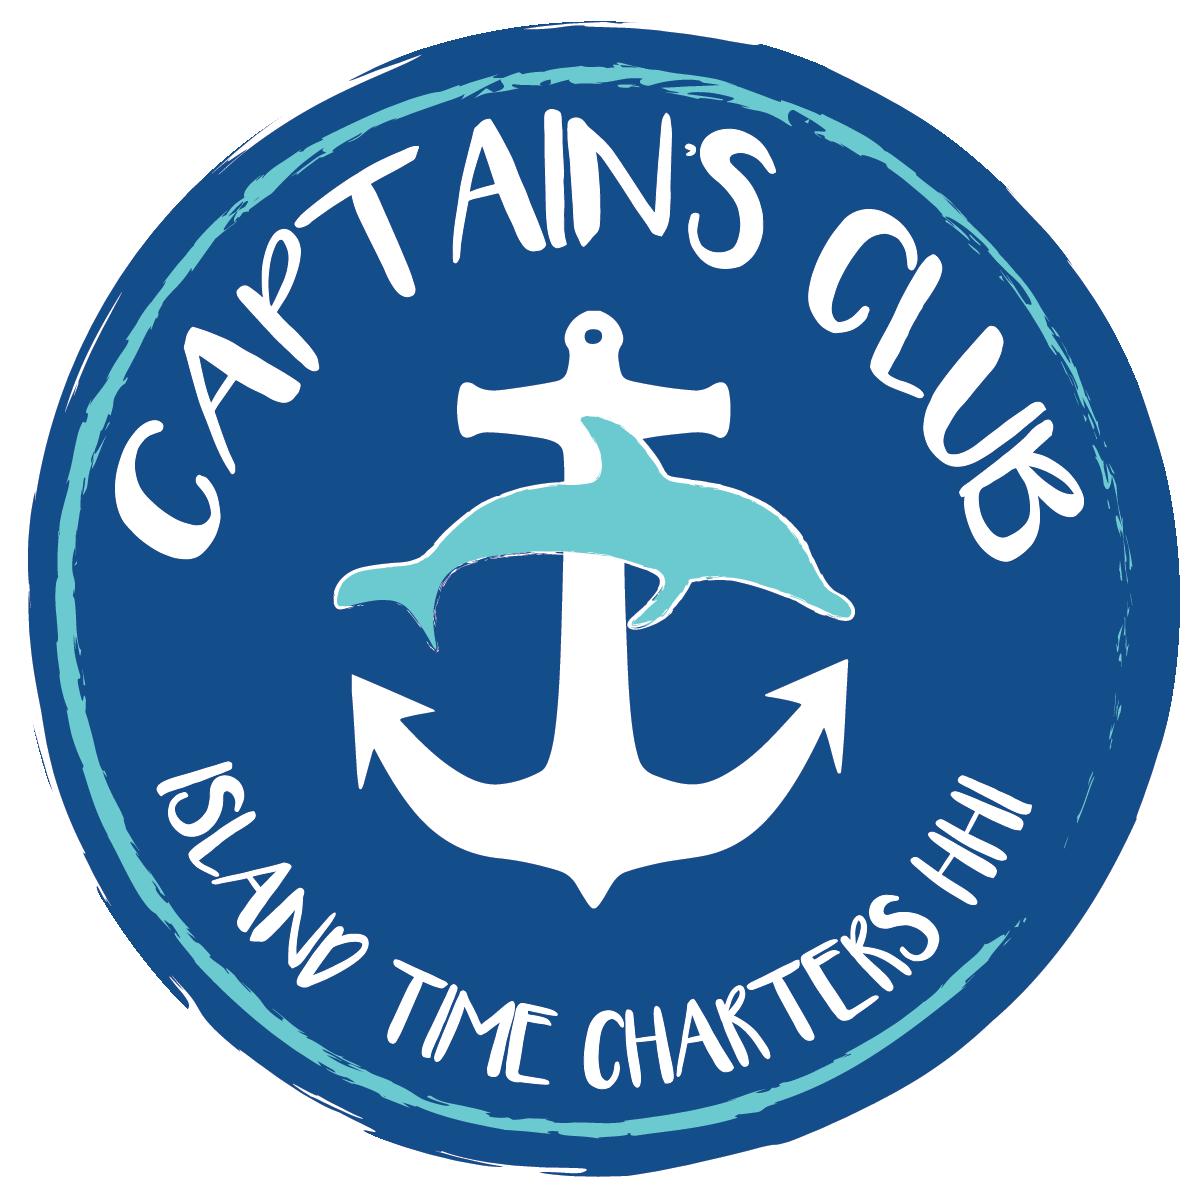 Captain's Club Sticker 4x4-01.png